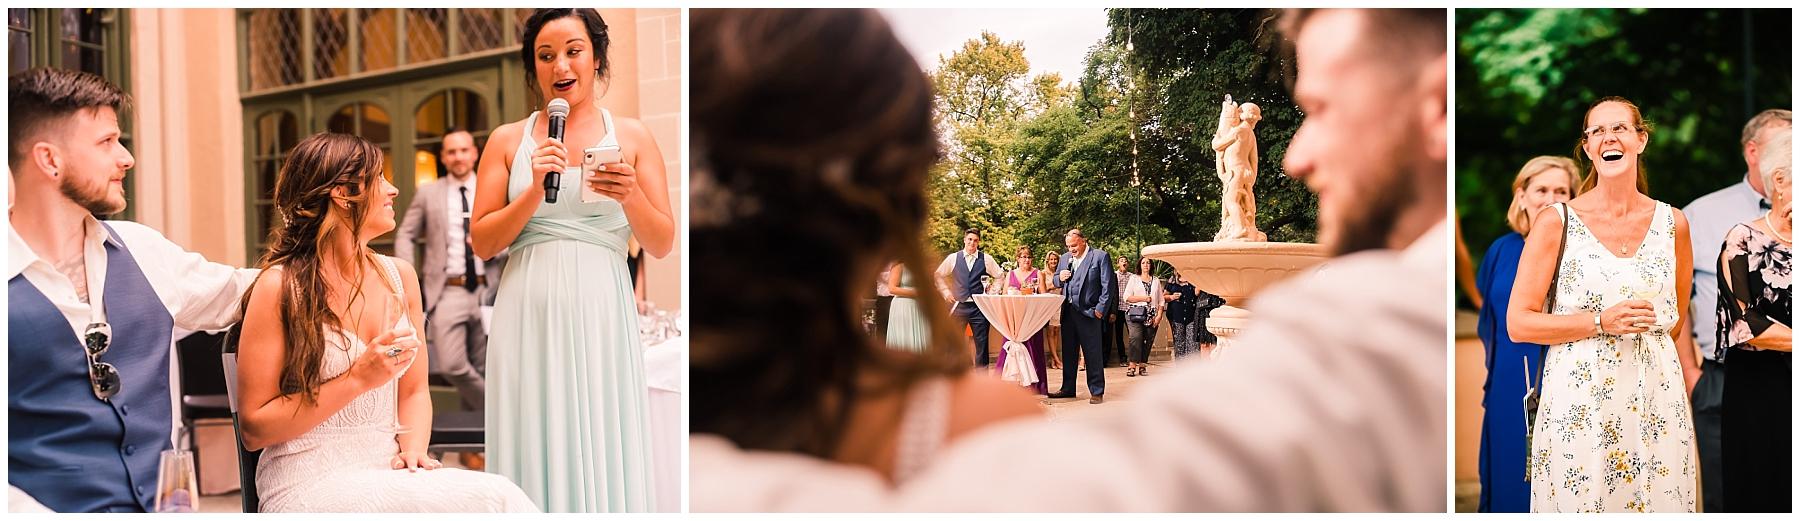 lafayette indiana wedding photography destination wedding fowler house mansion_0120.jpg